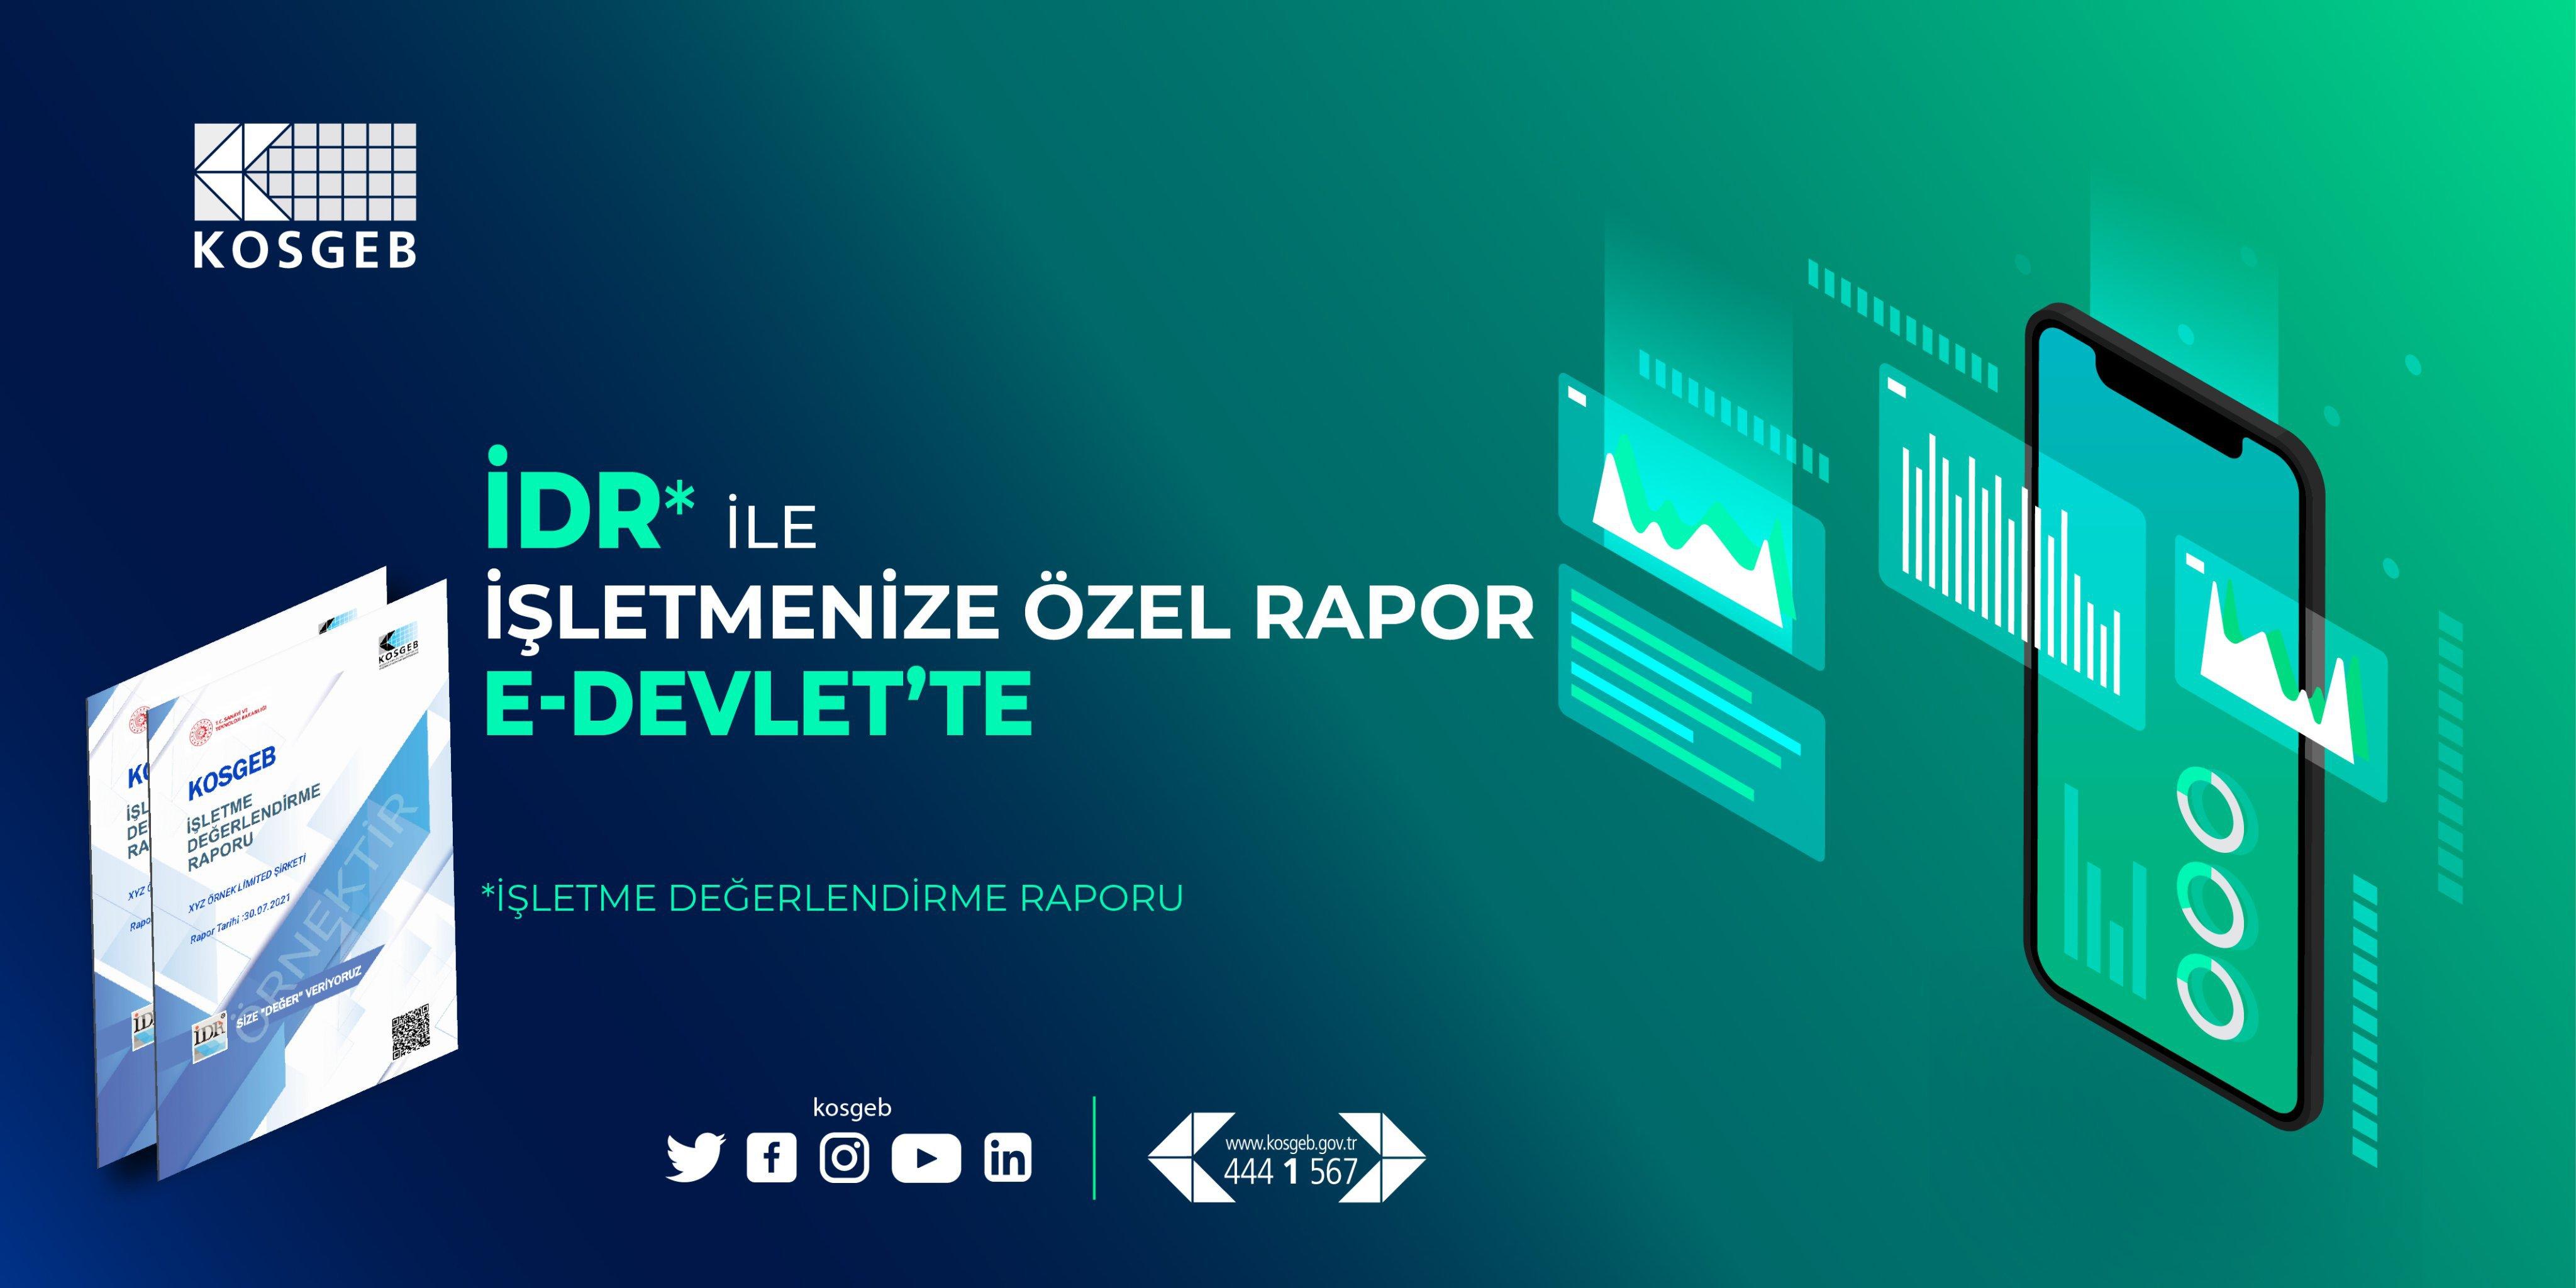 İŞLETMENİZE ÖZEL RAPOR E-DEVLET'TE